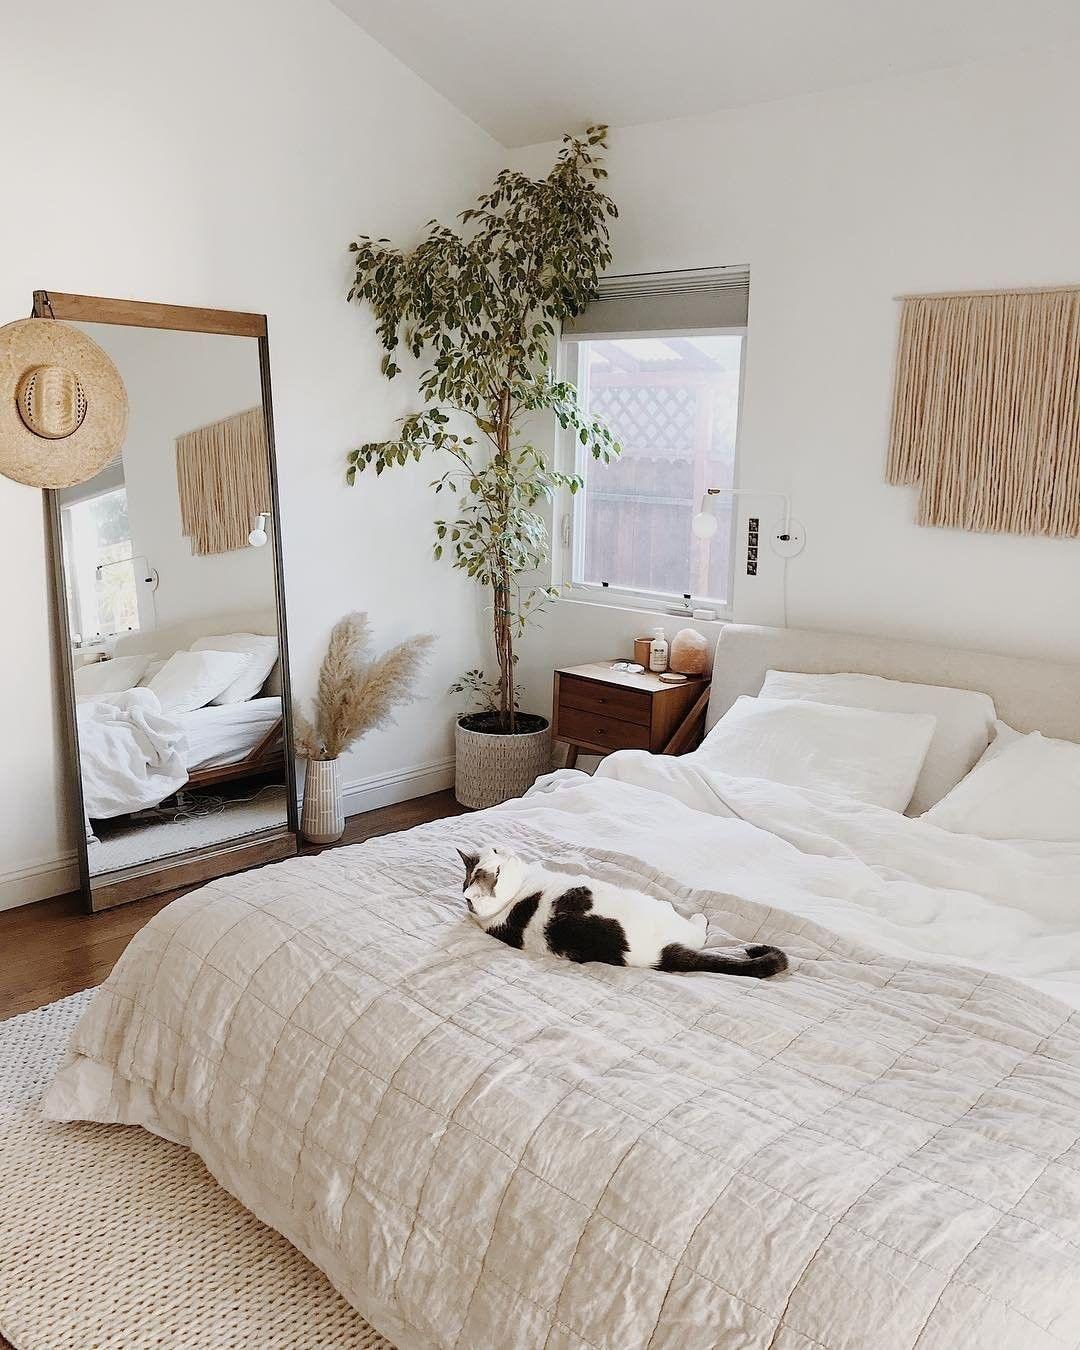 Paltry Home Furniture Illustration #furniturebandung #LivingRoomFurnitureWithTv